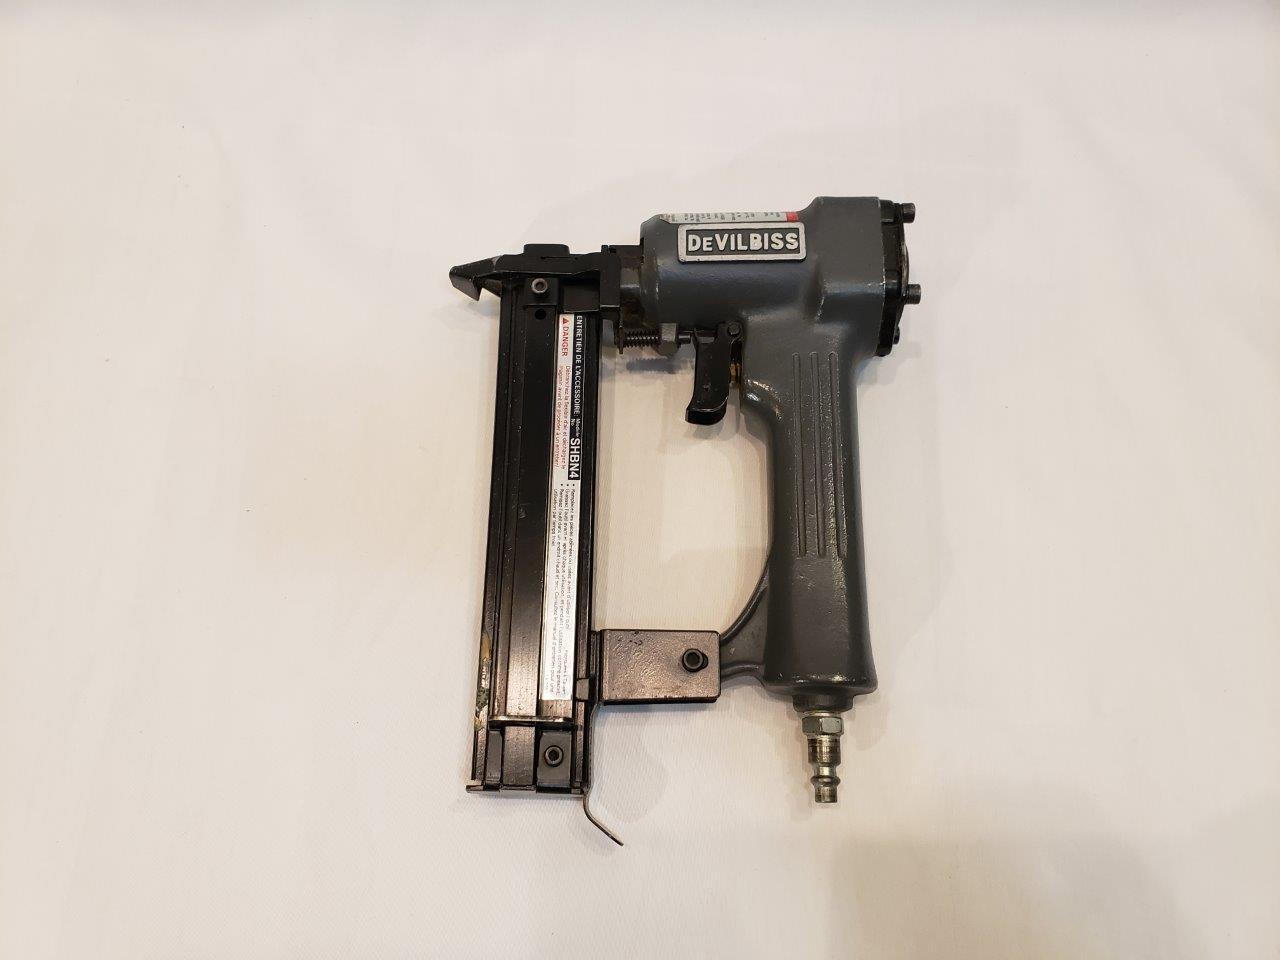 18 Gauge Brad Air Nailer, DeVilbiss Nail Gun Pneumatic fastener